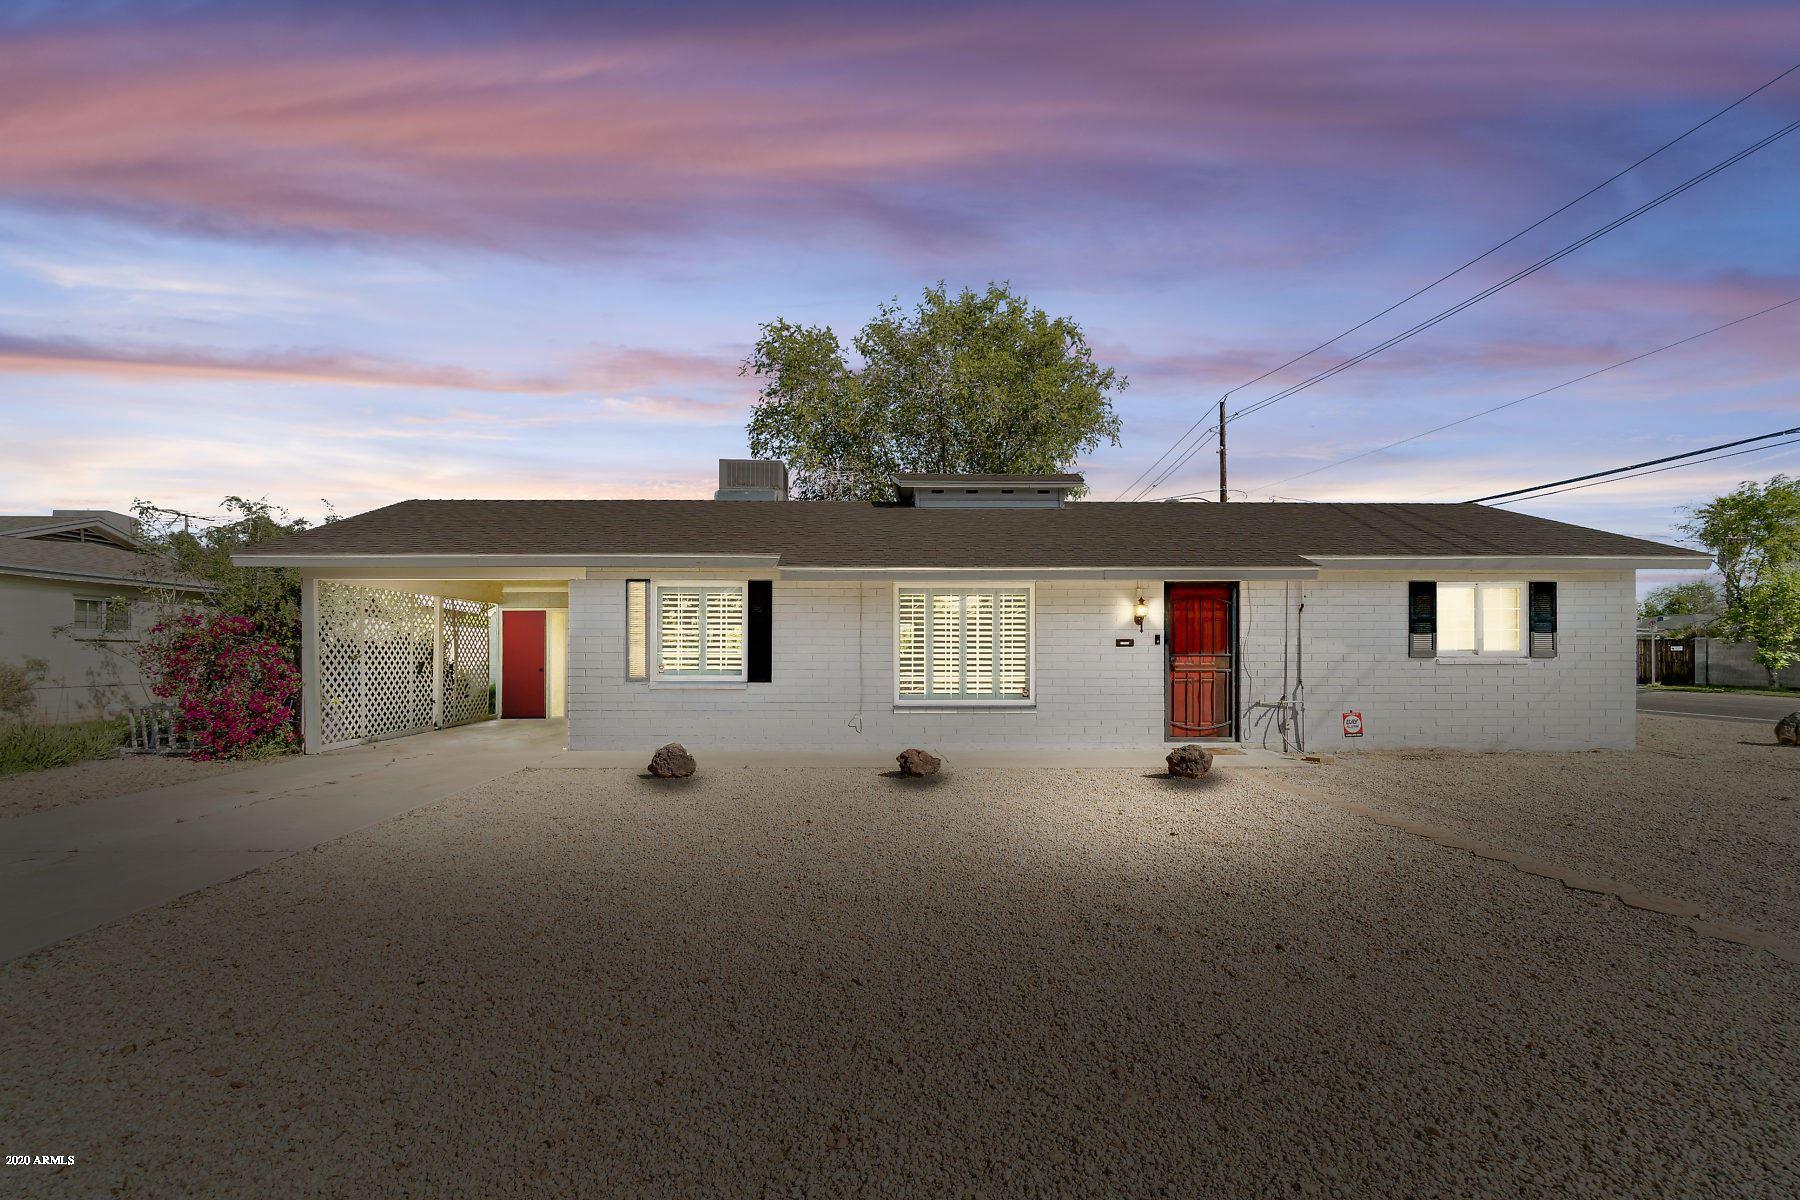 2302 W Flower Street, Phoenix, AZ 85015 - MLS#: 6052035